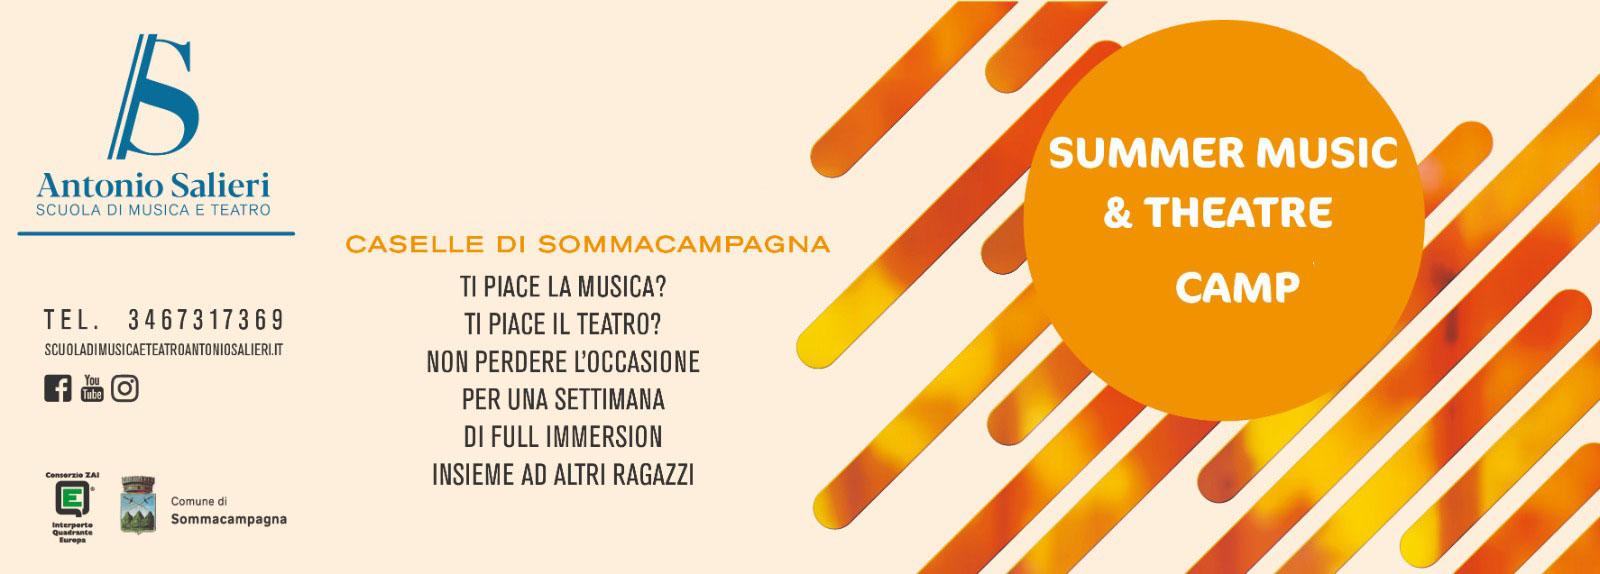 Summer Camp Scuola Salieri